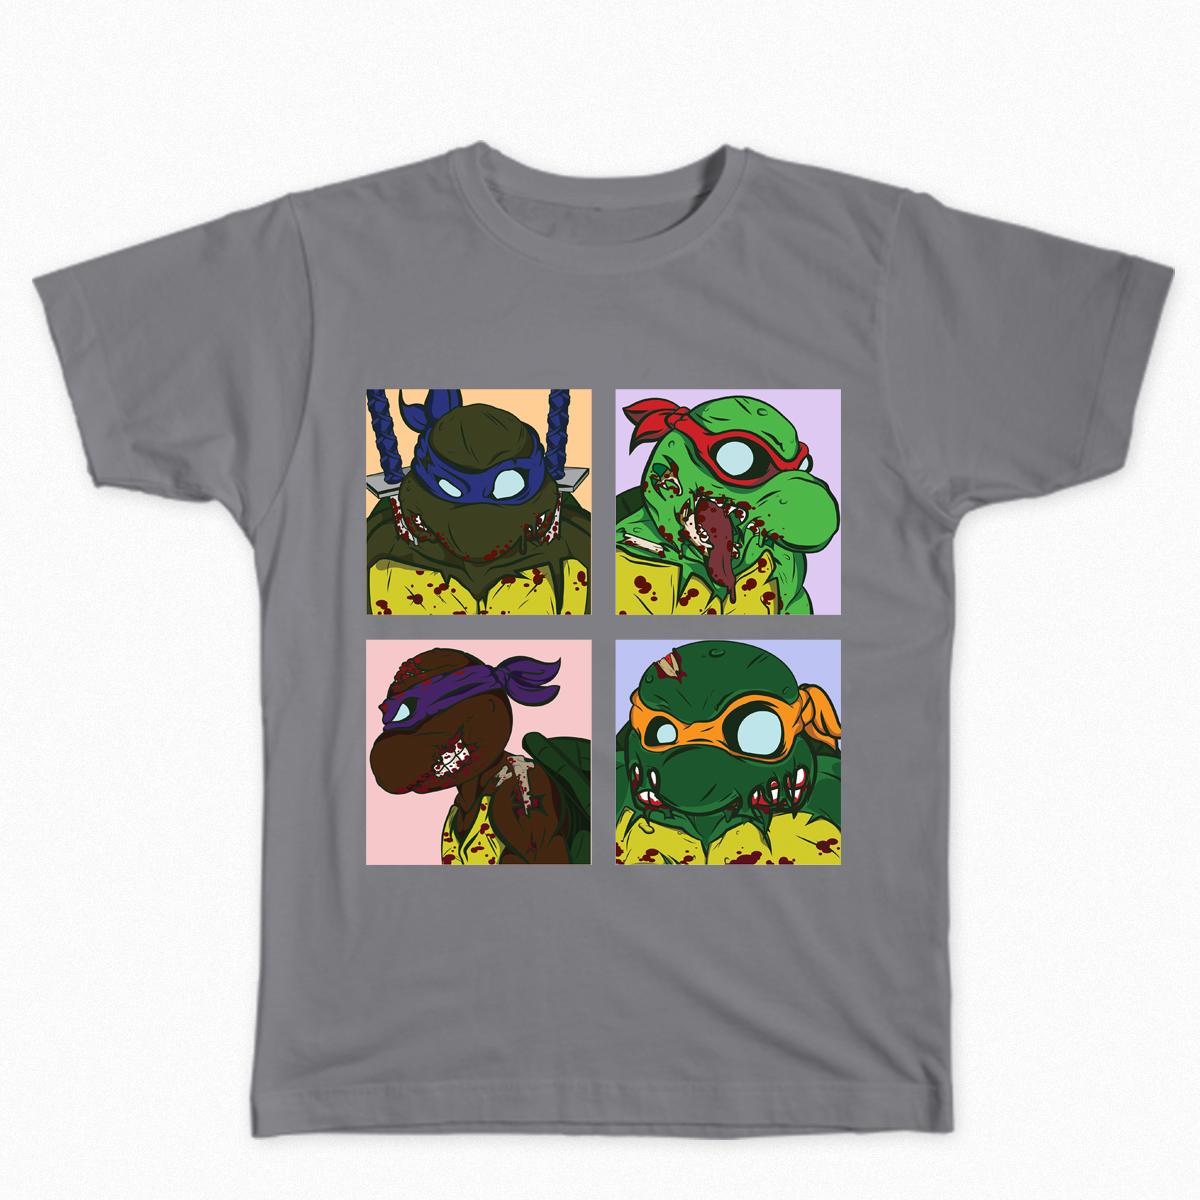 Teenage Mutant Ninja Zombies by Party_Moth59 on Threadless